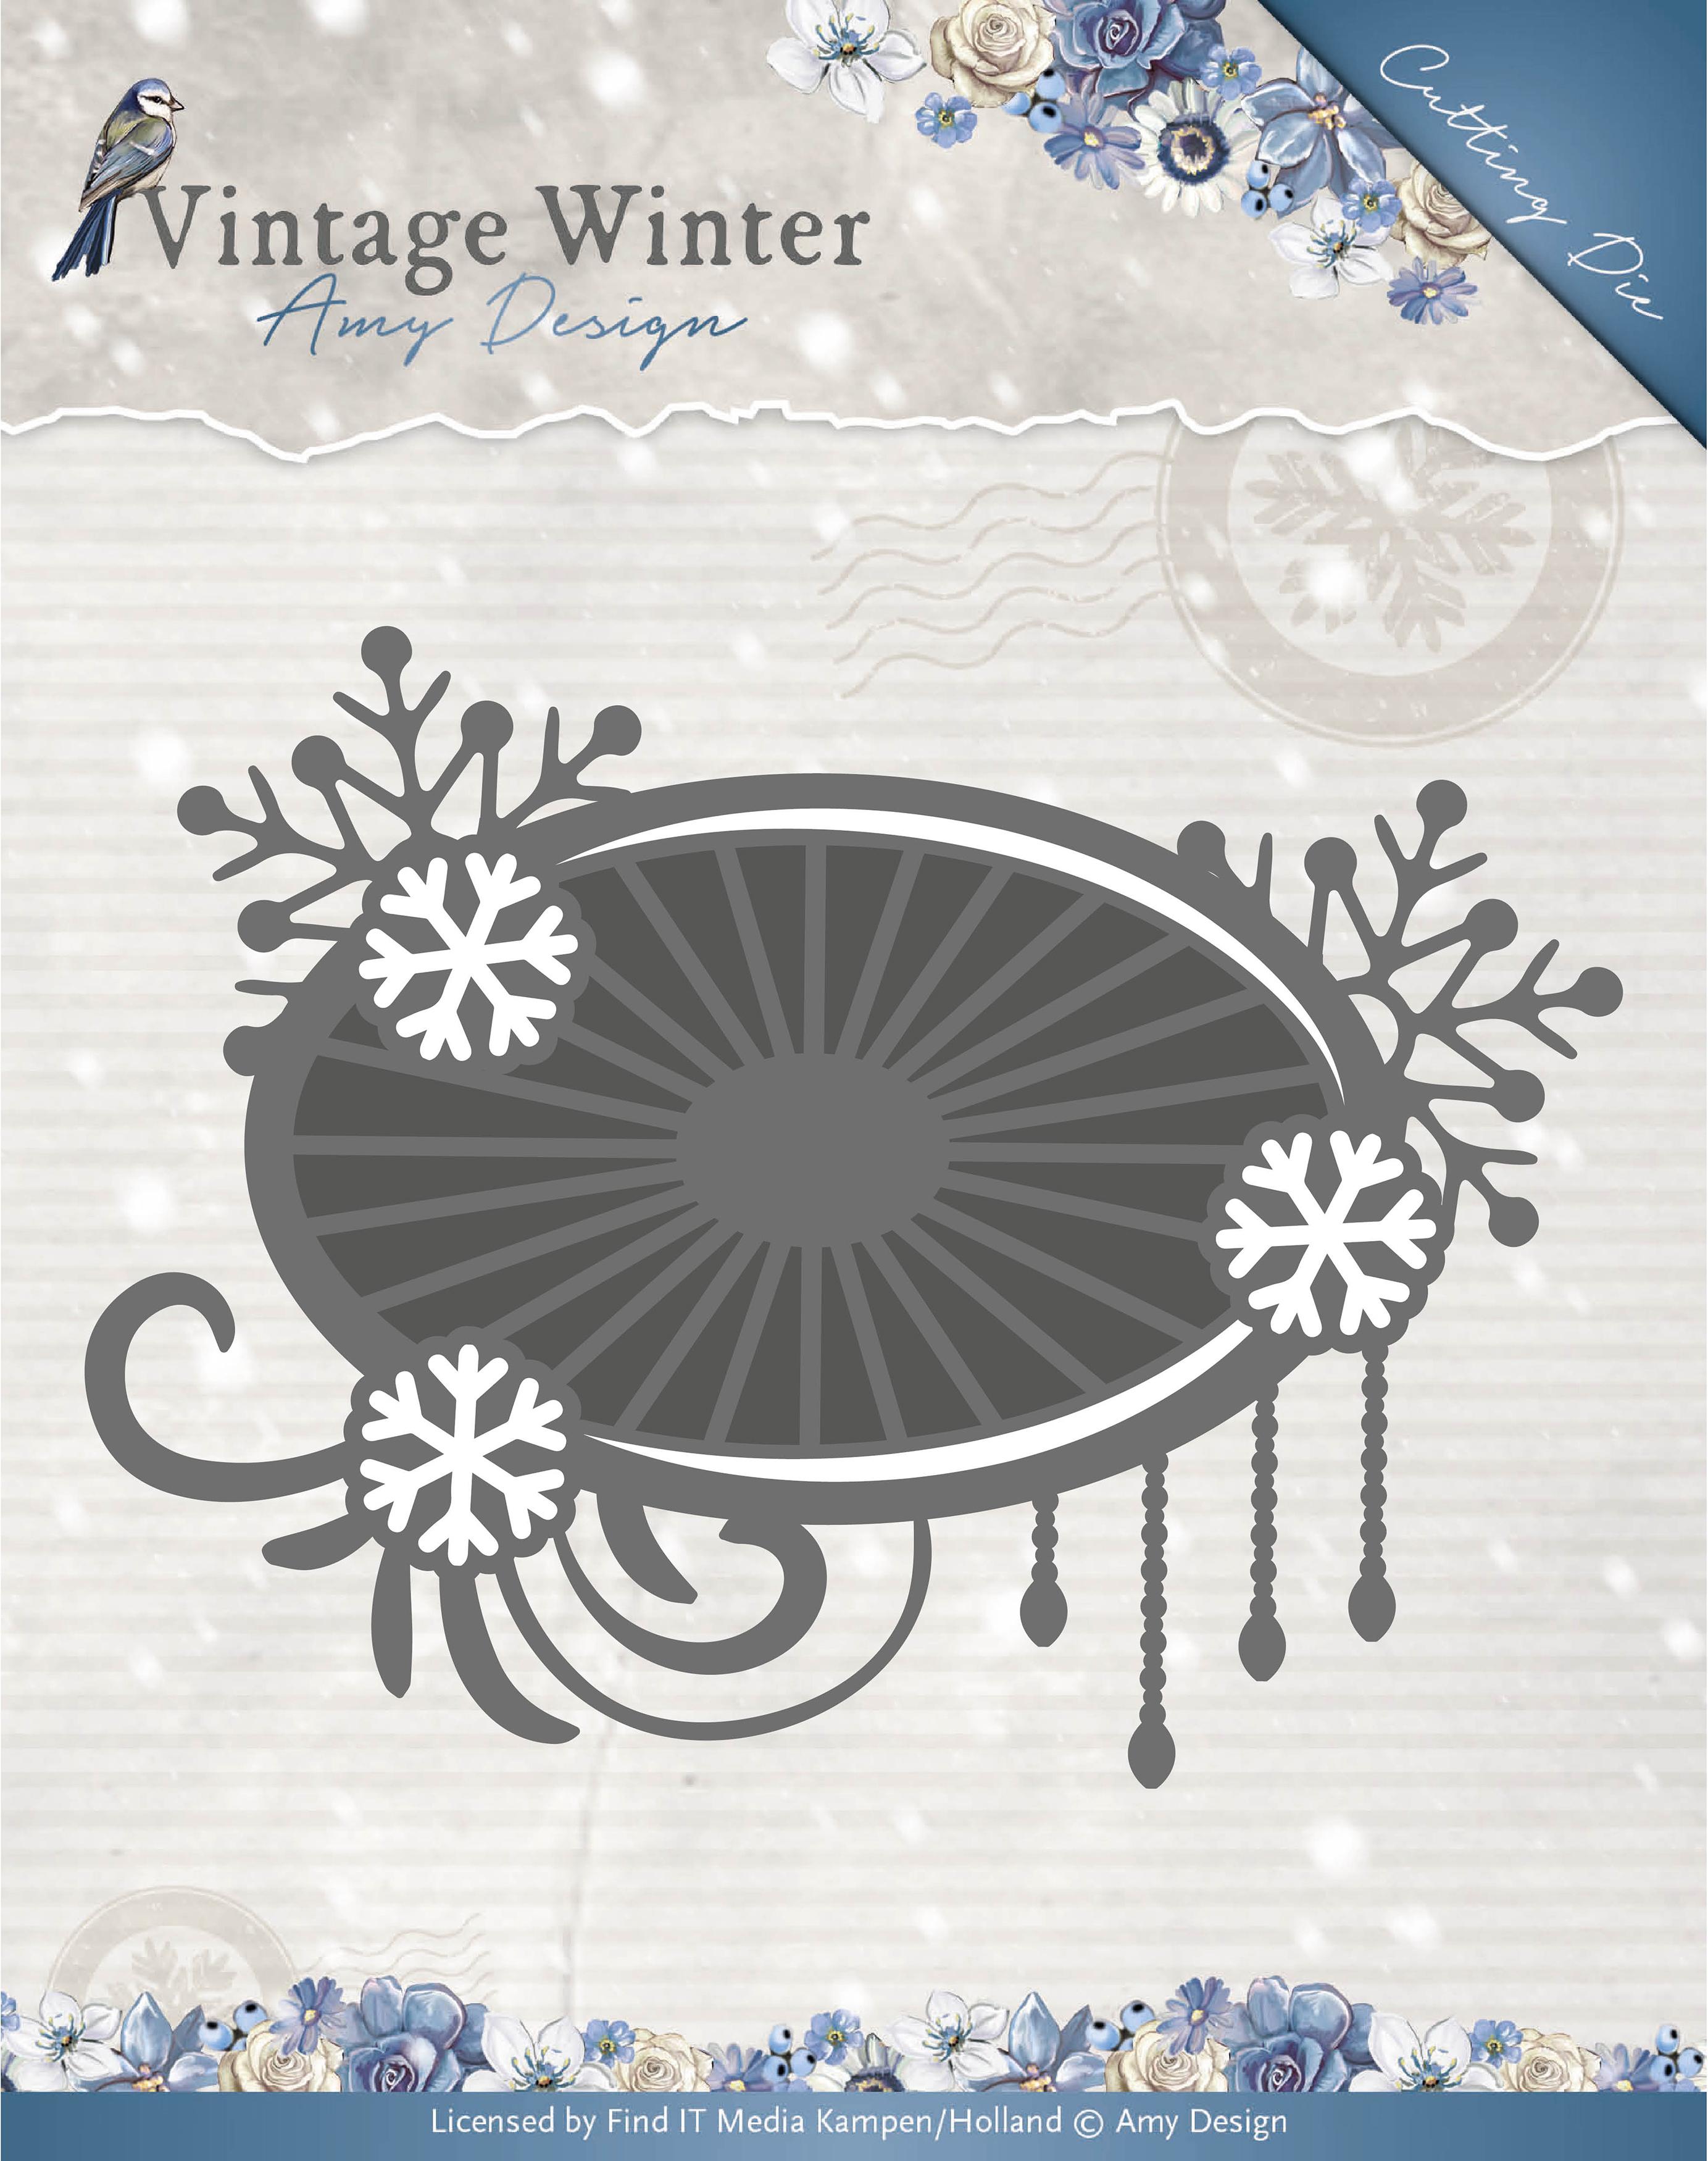 Snowflake Swirl Label - Find It Trading Amy Design Vintage Winter Die